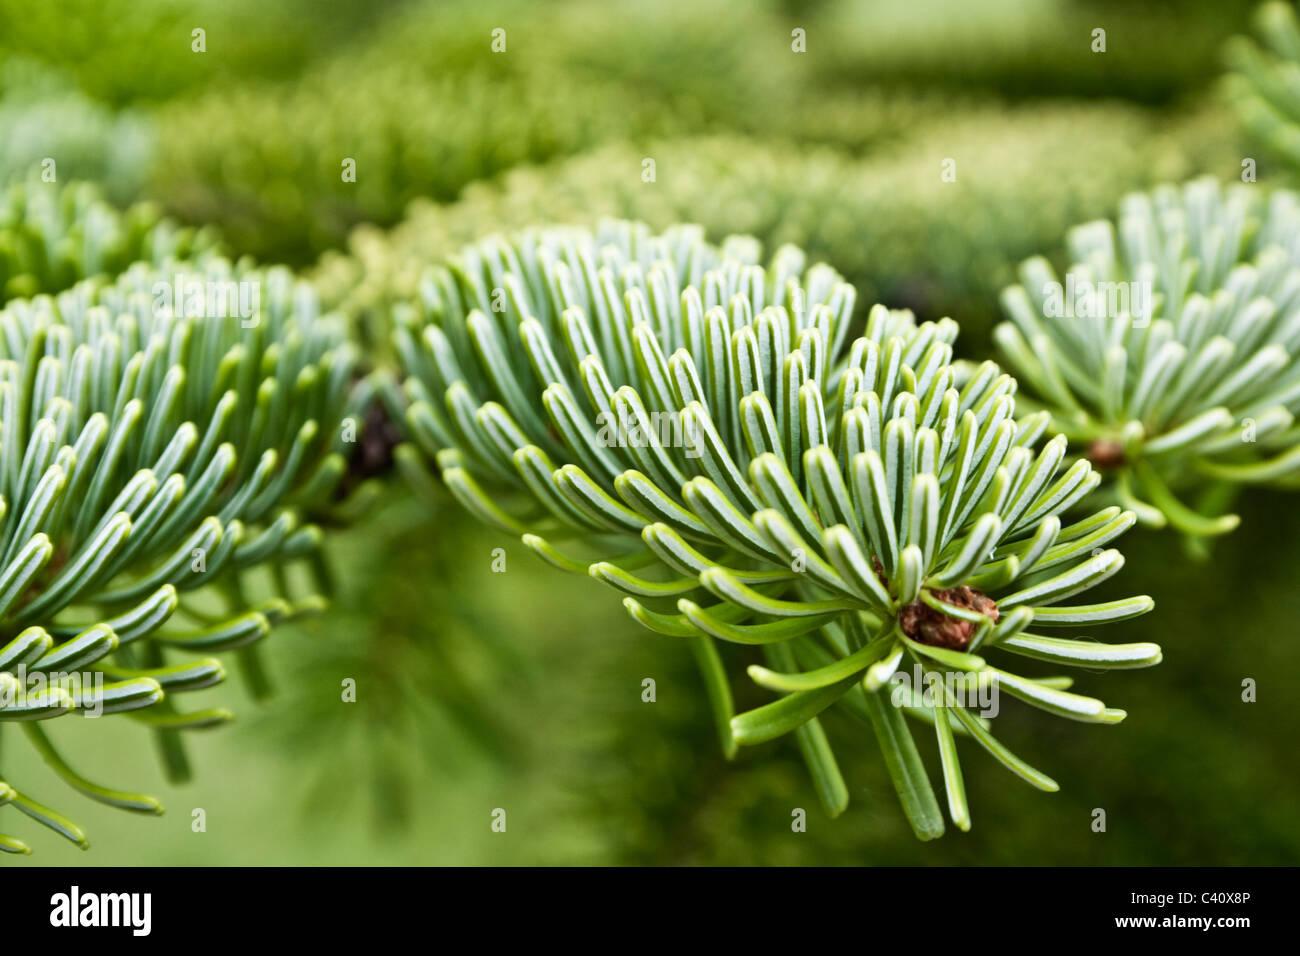 pine tree branch - Stock Image